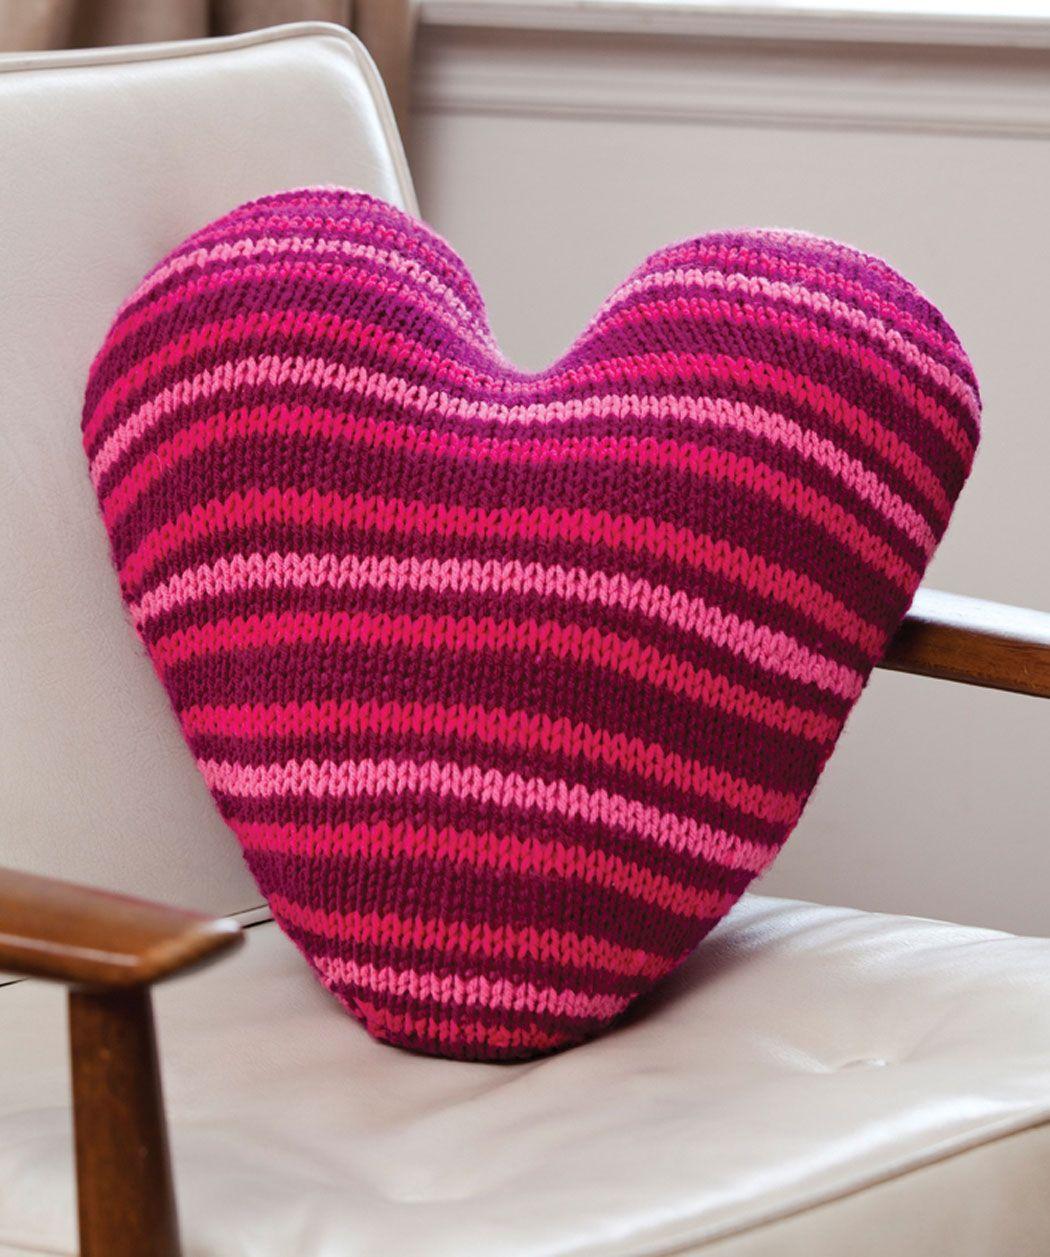 Pillow talk knitting pattern red heart knitting crochet pillow talk knitting pattern red heart bankloansurffo Gallery